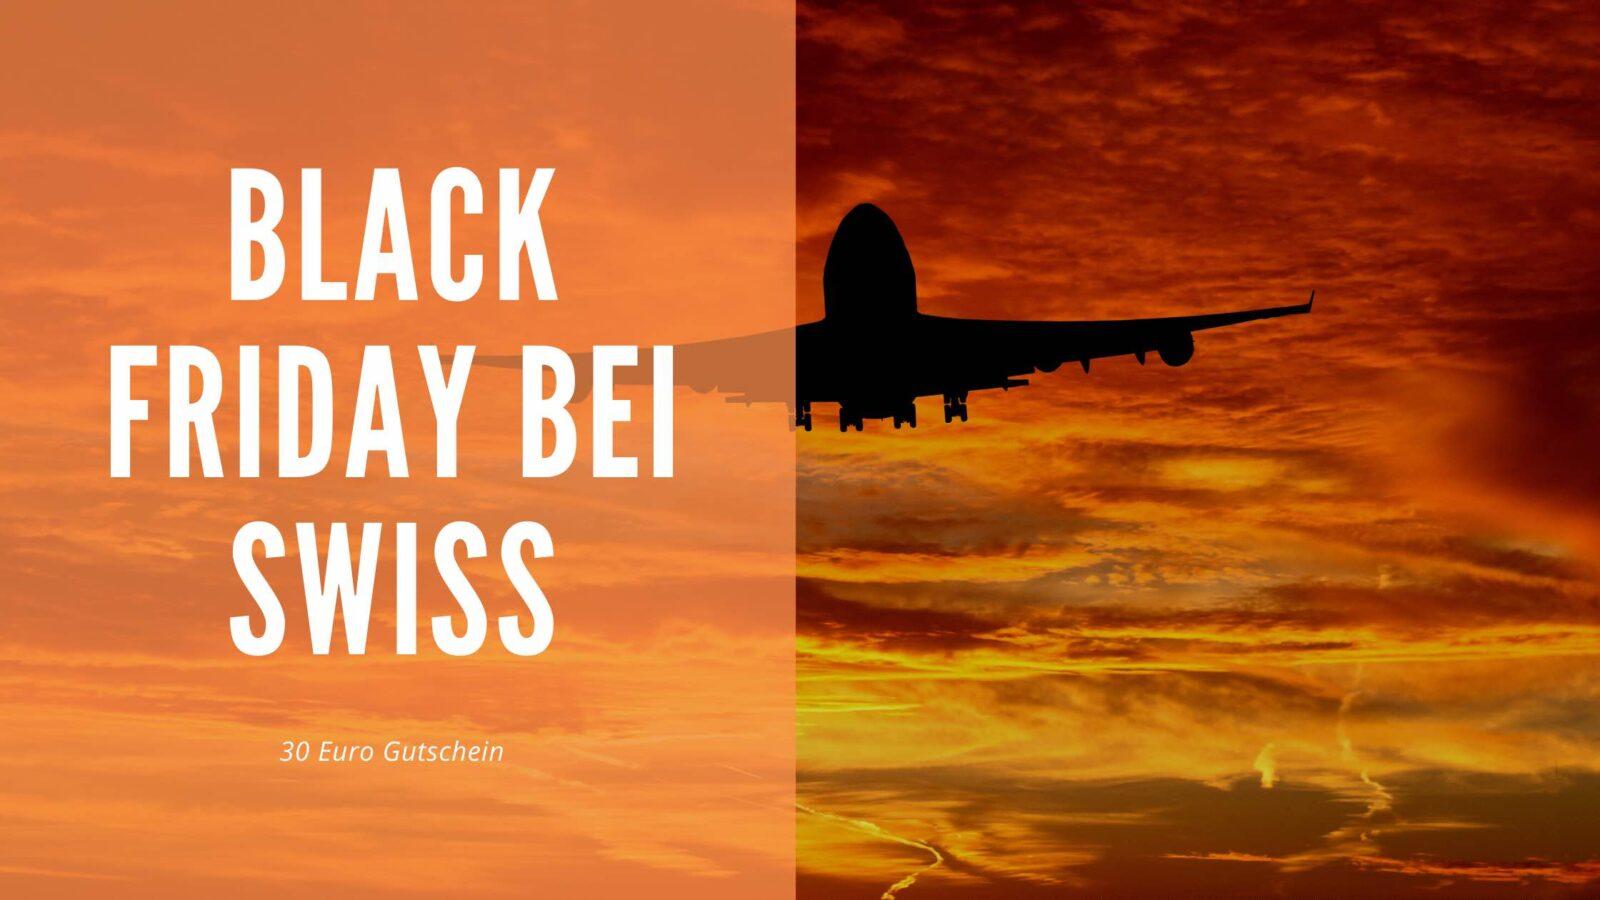 Spare 30 Euro beim SWISS Black Friday Deal